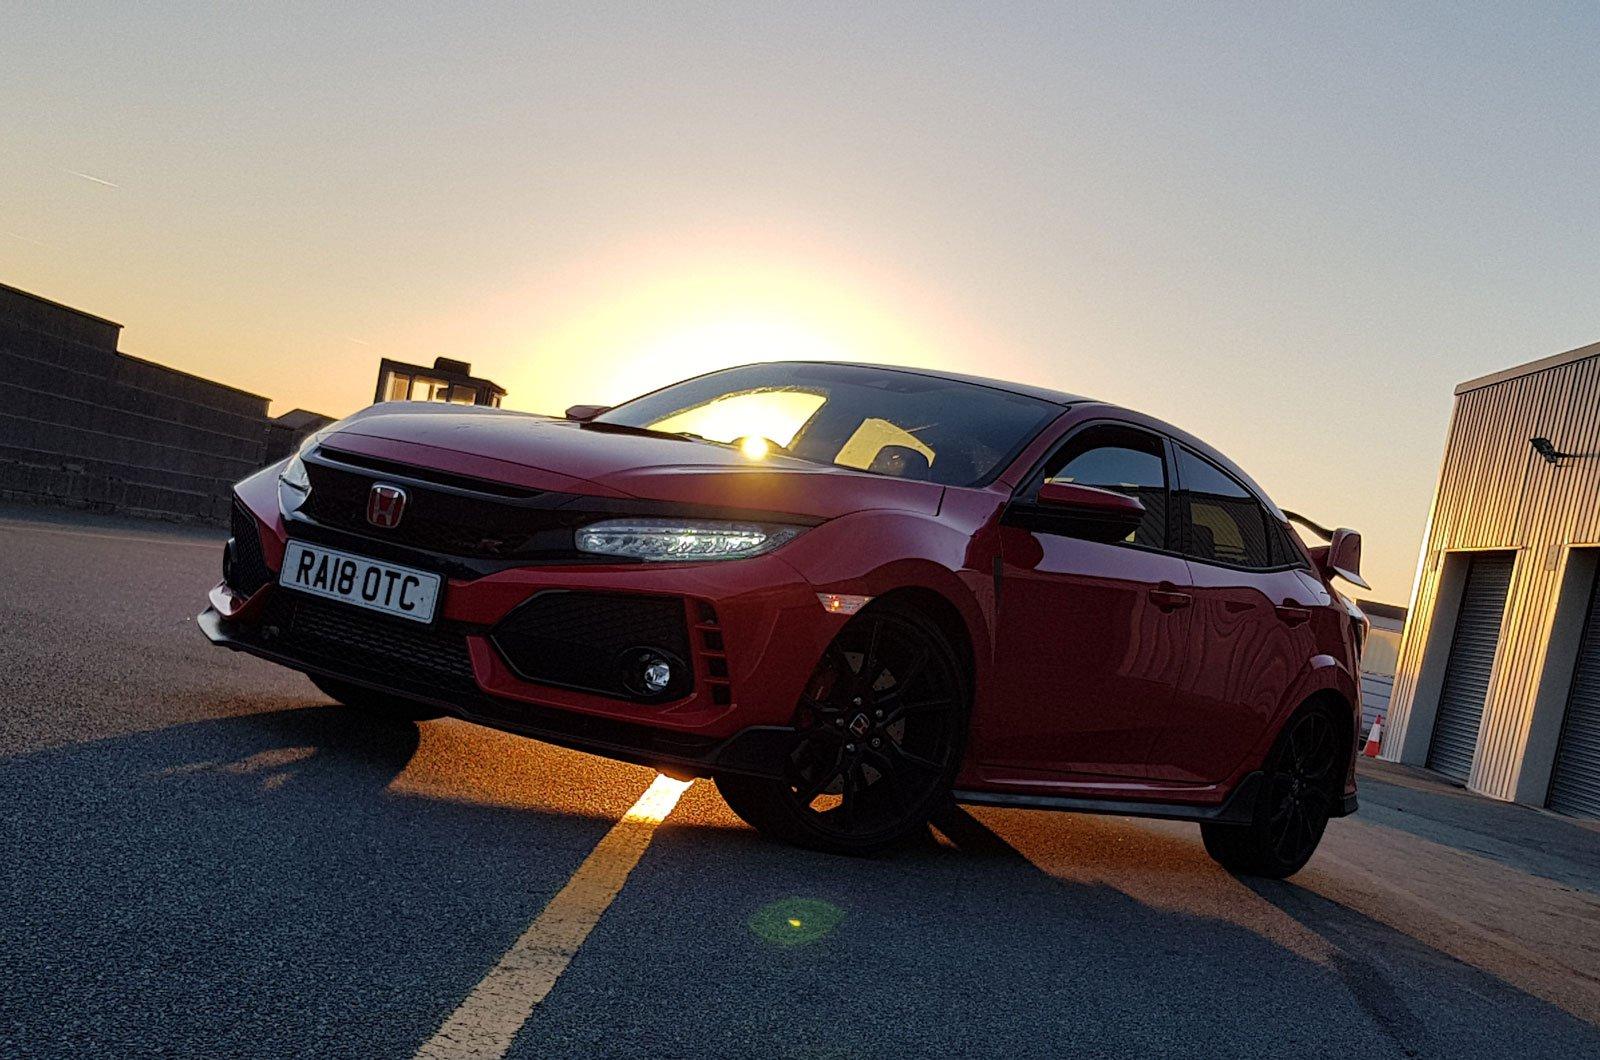 Honda Civic Type R long-termer at Anglesea track front